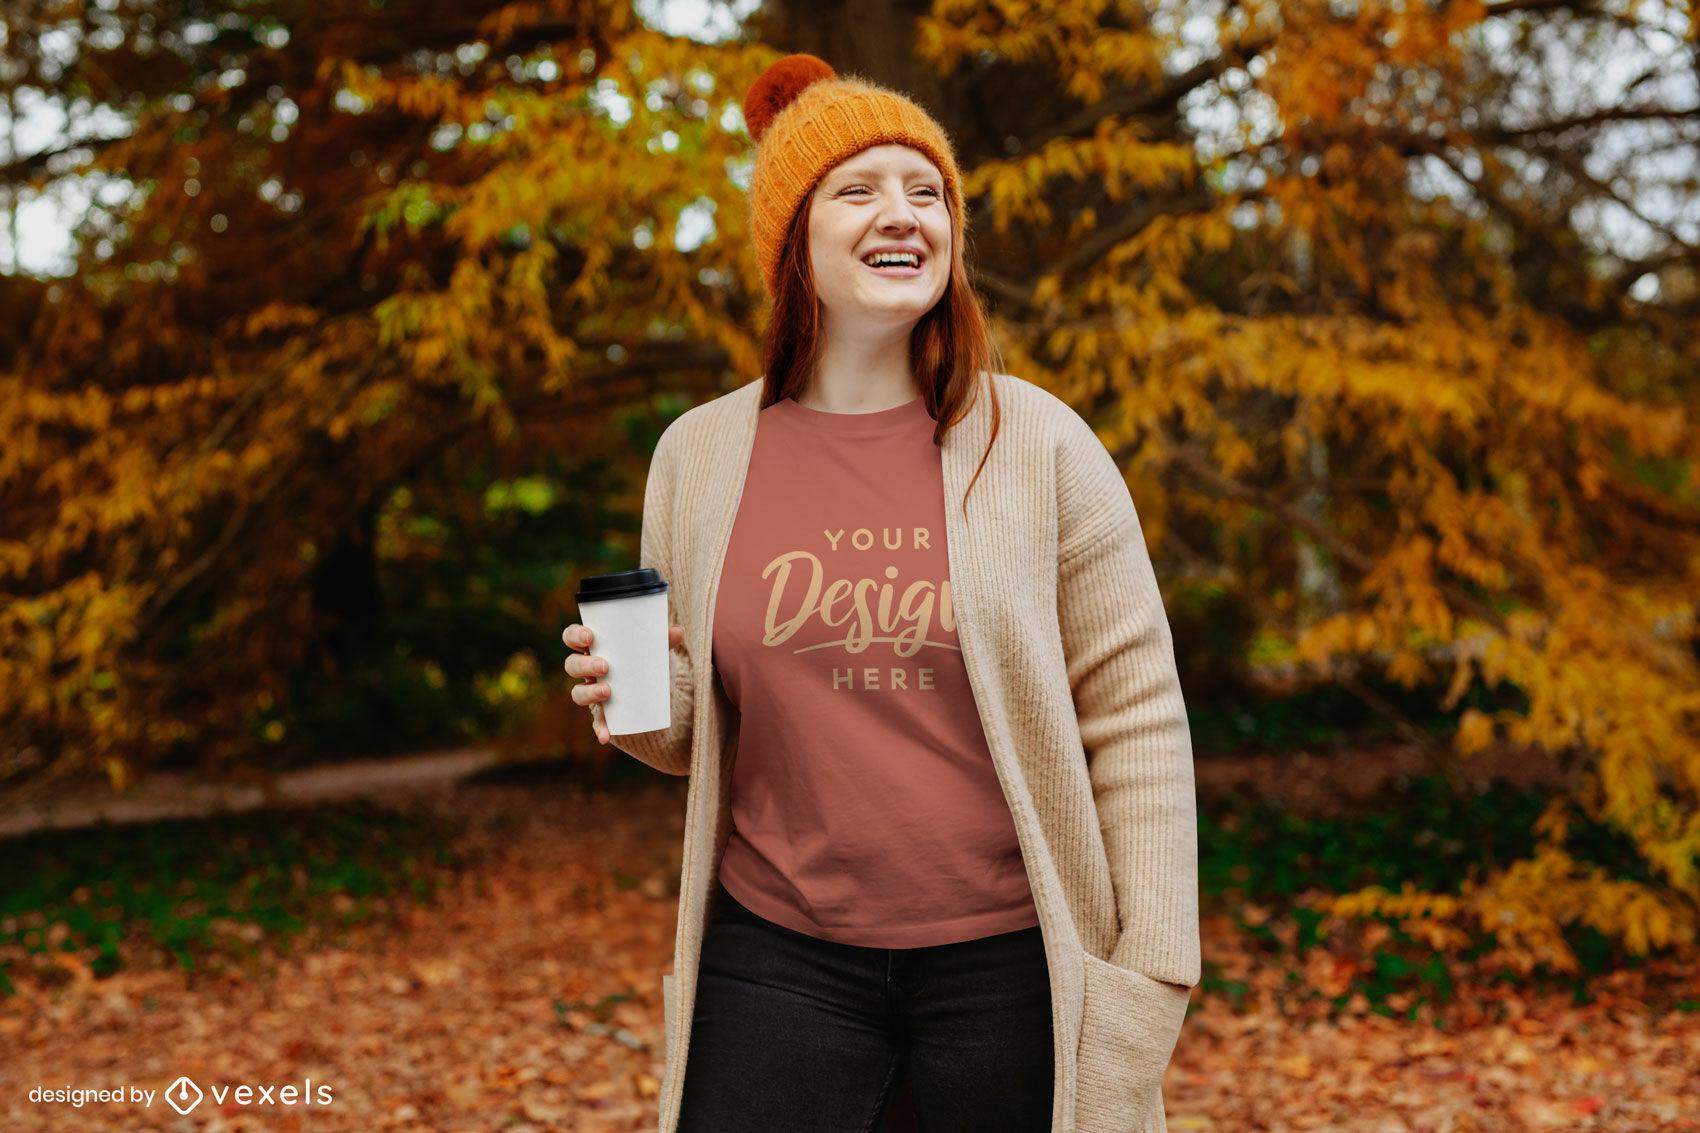 Ingwer im Herbstpark-Sweatshirt-Modell